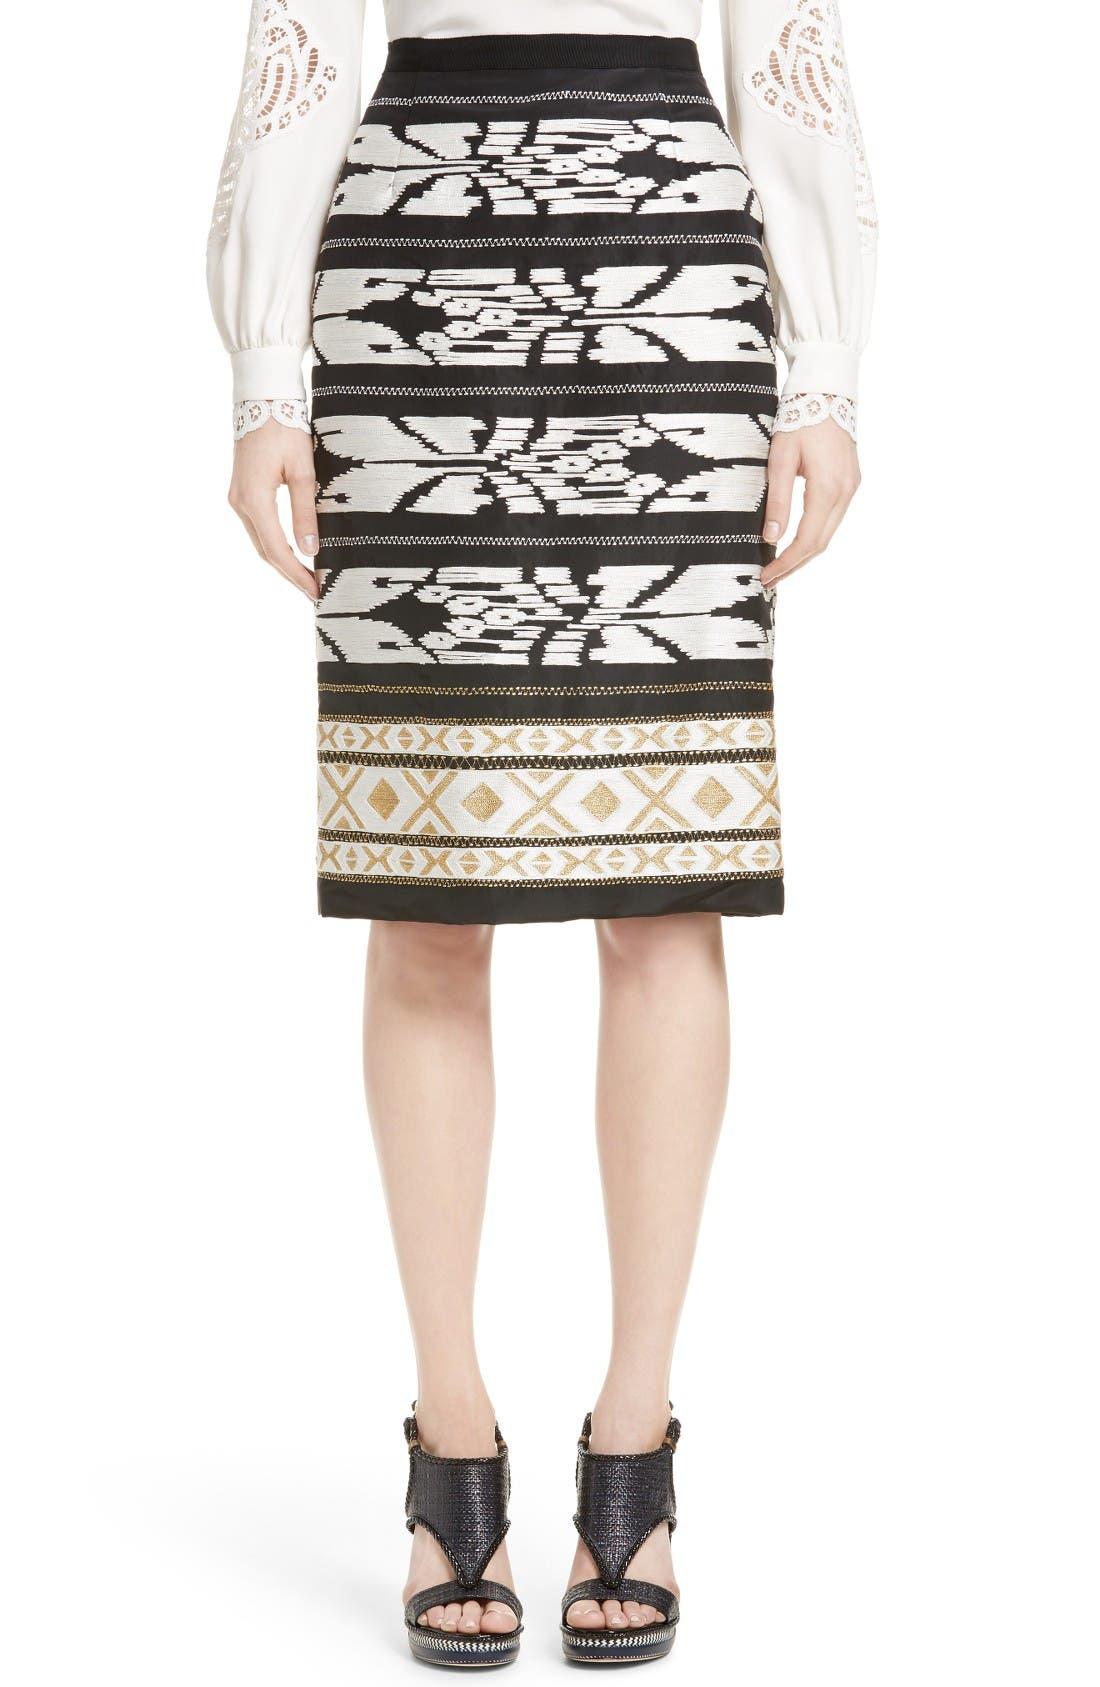 Alternate Image 1 Selected - Oscar de la Renta Ikat Embroidered Pencil Skirt